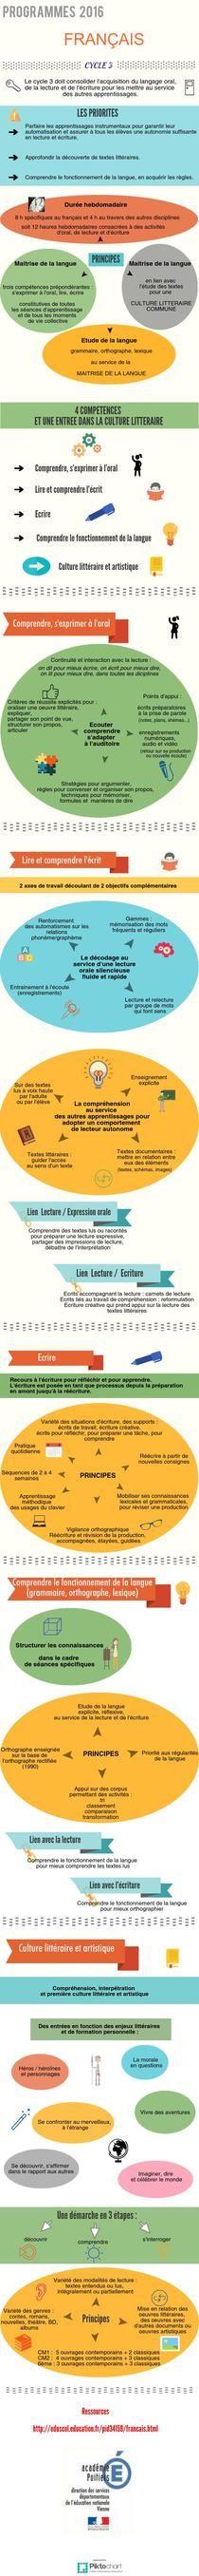 Français Cycle 3 | Piktochart Infographic Editor                                                                                                                                                                                 Plus